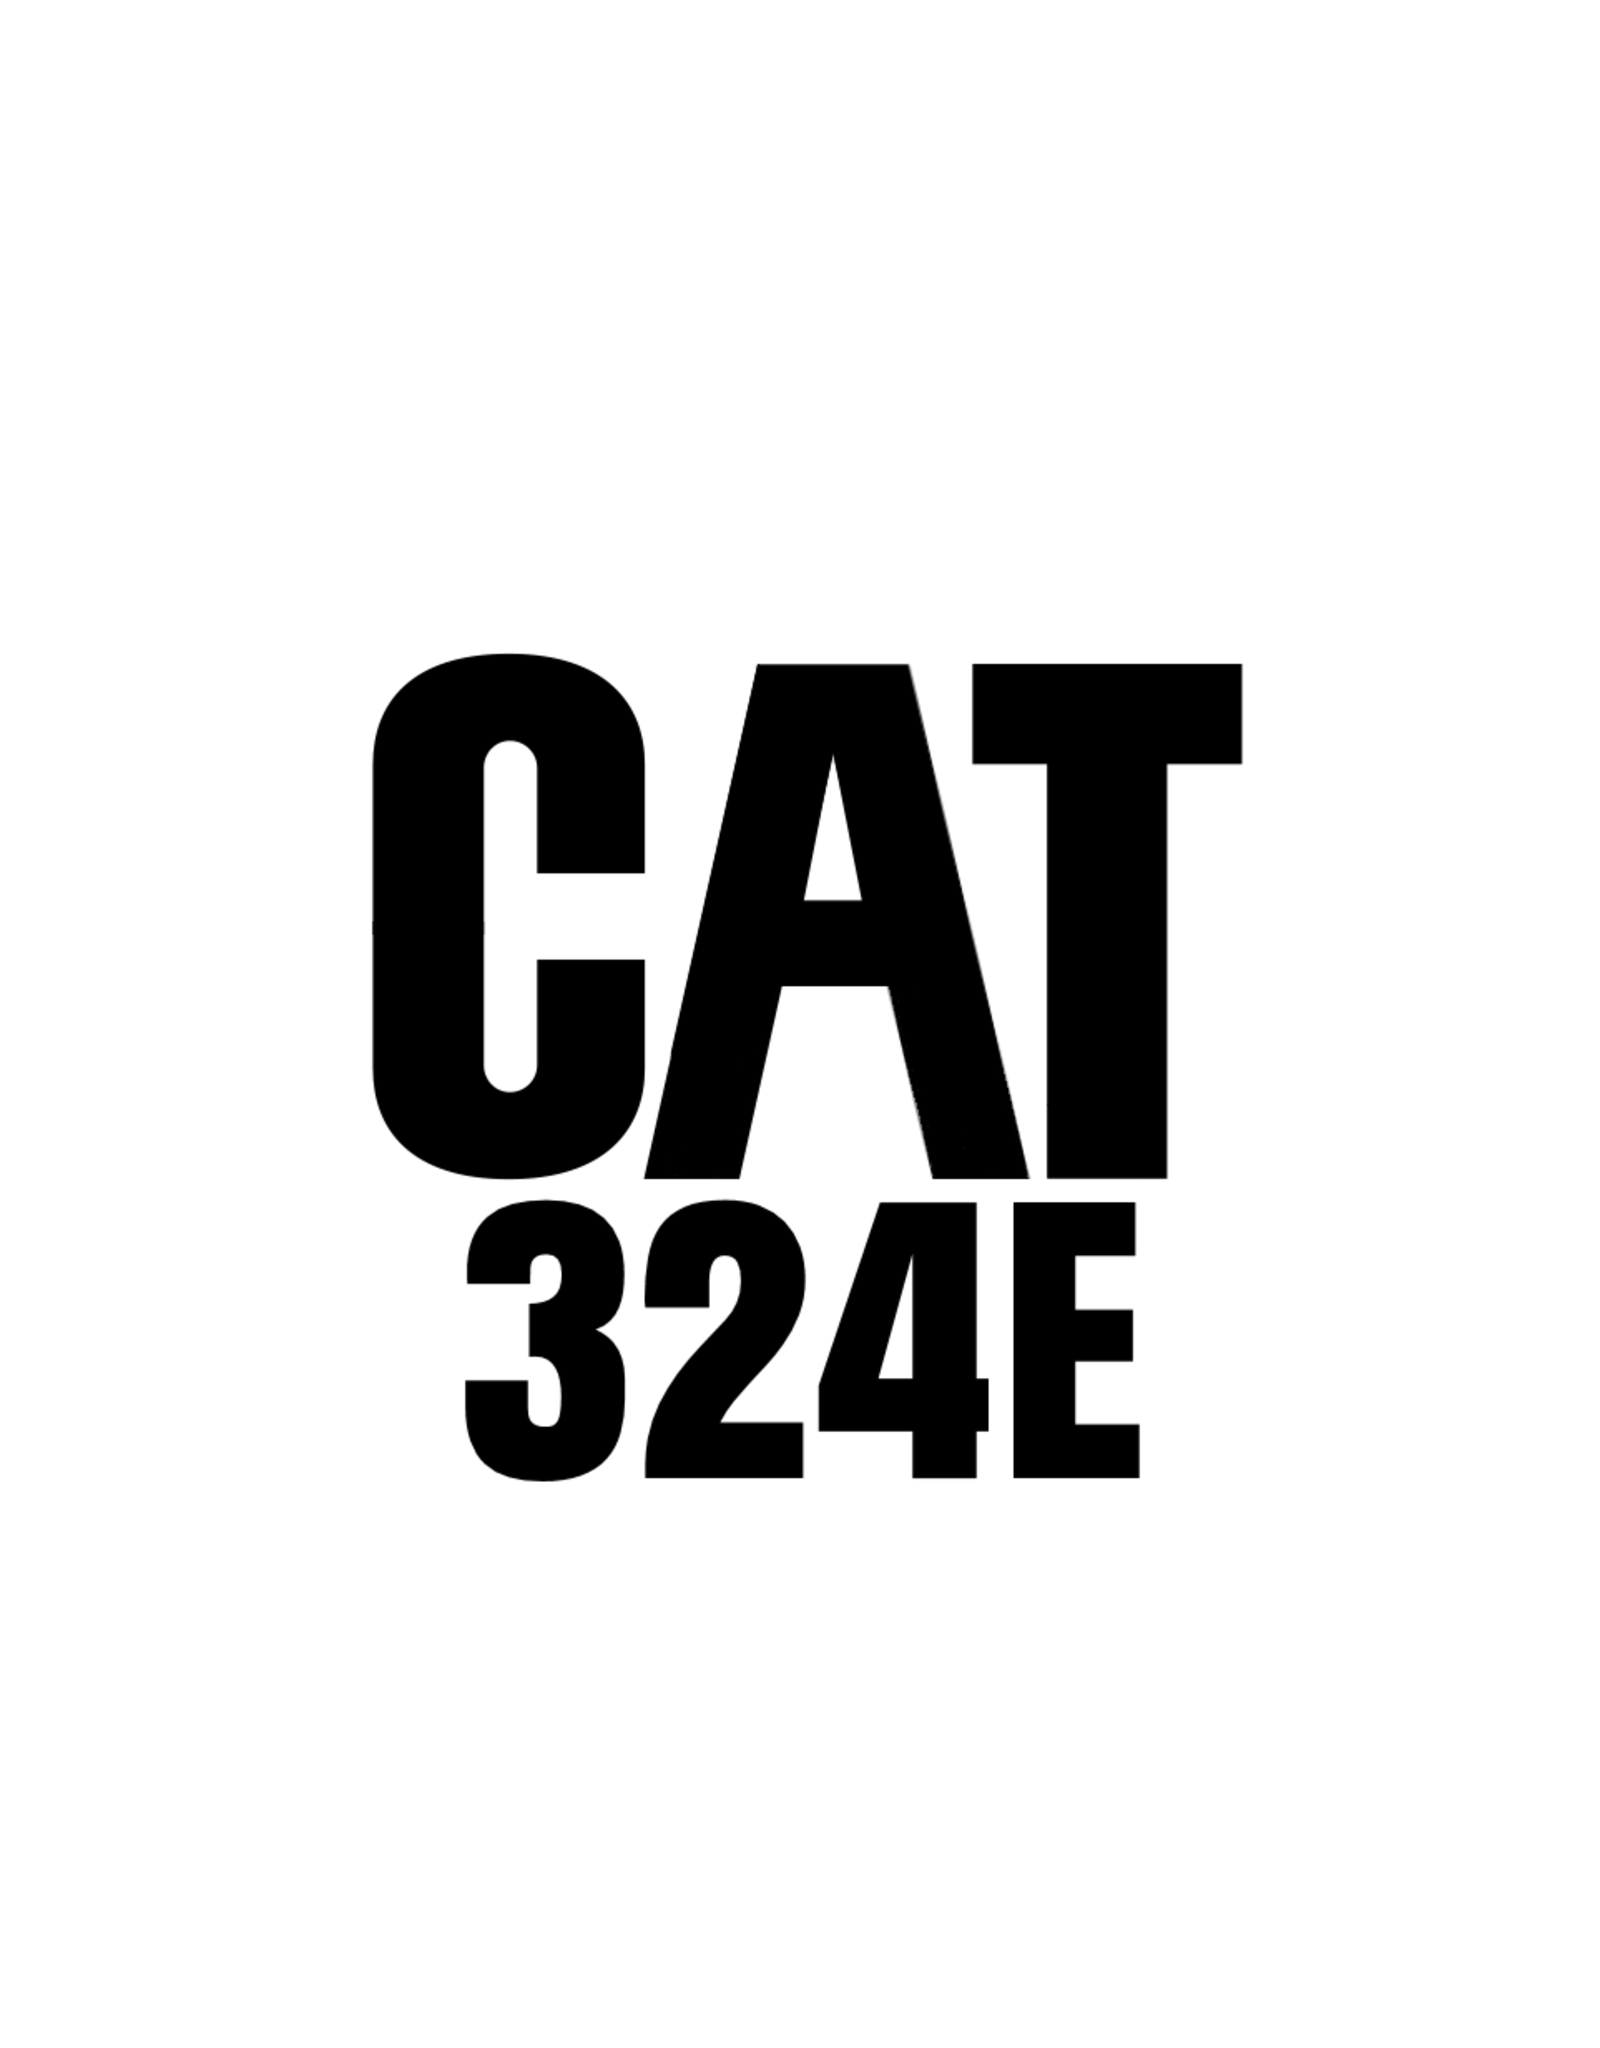 Echle Hartstahl GmbH FOPS für CAT 324E